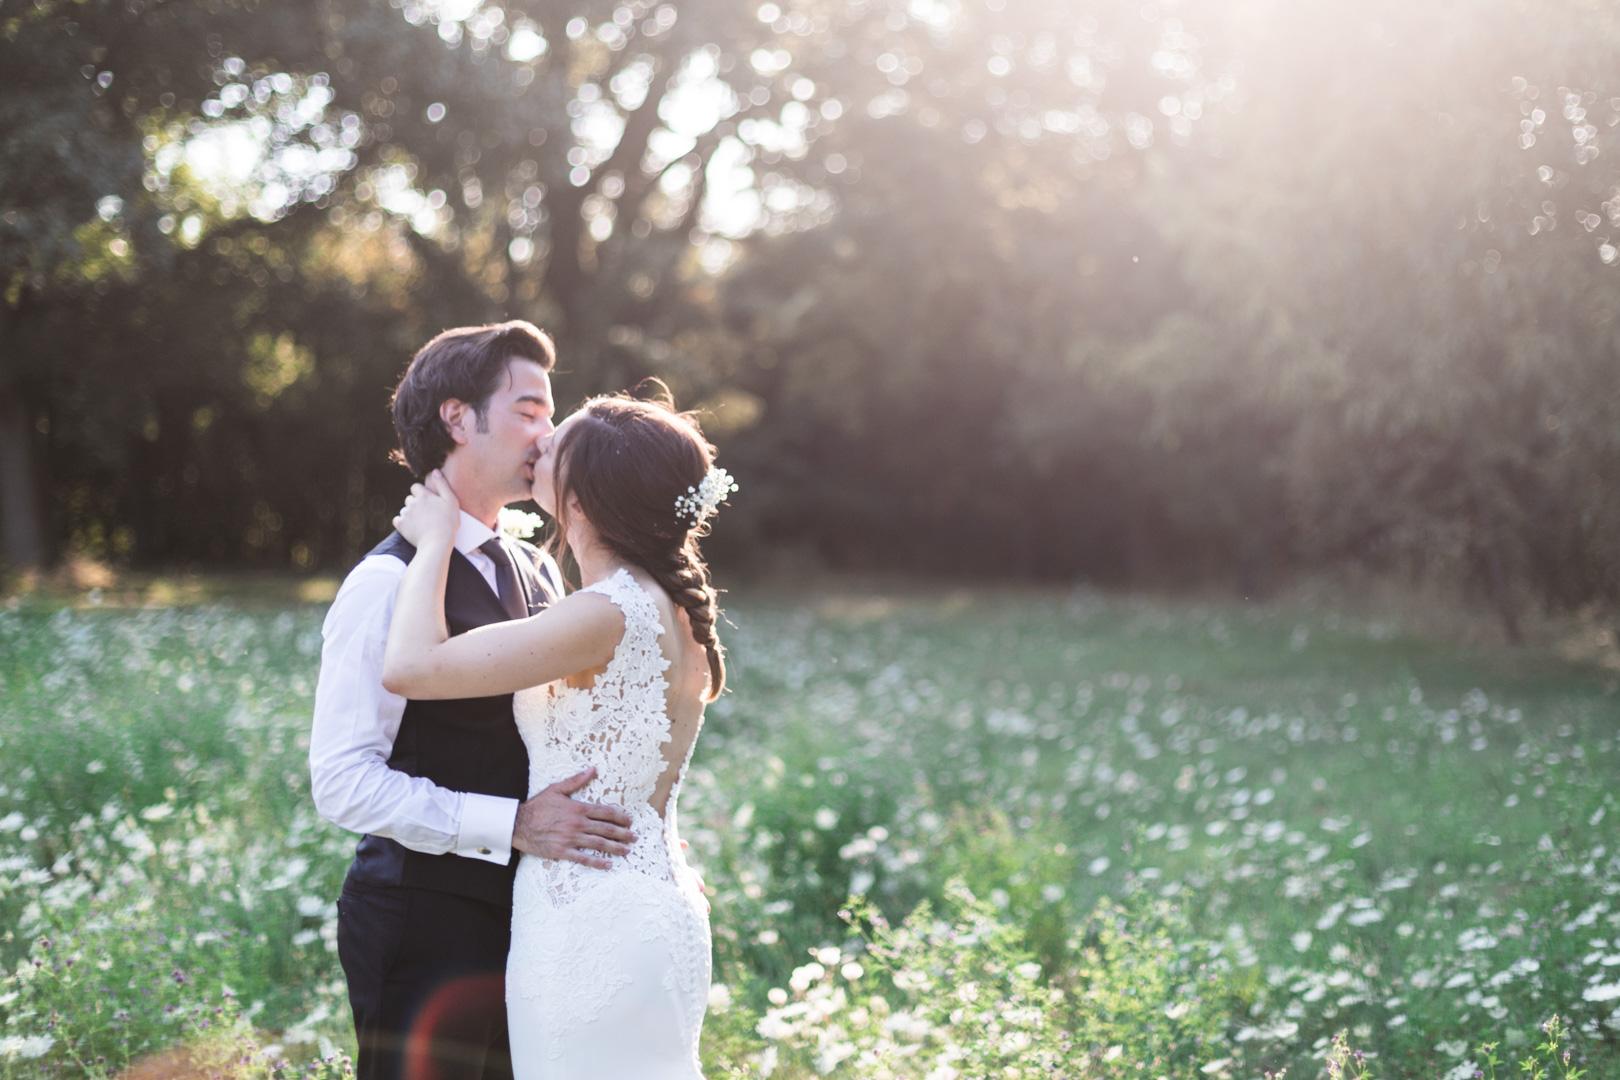 Andreas_Pinacci_Wedding_Photographer-40.